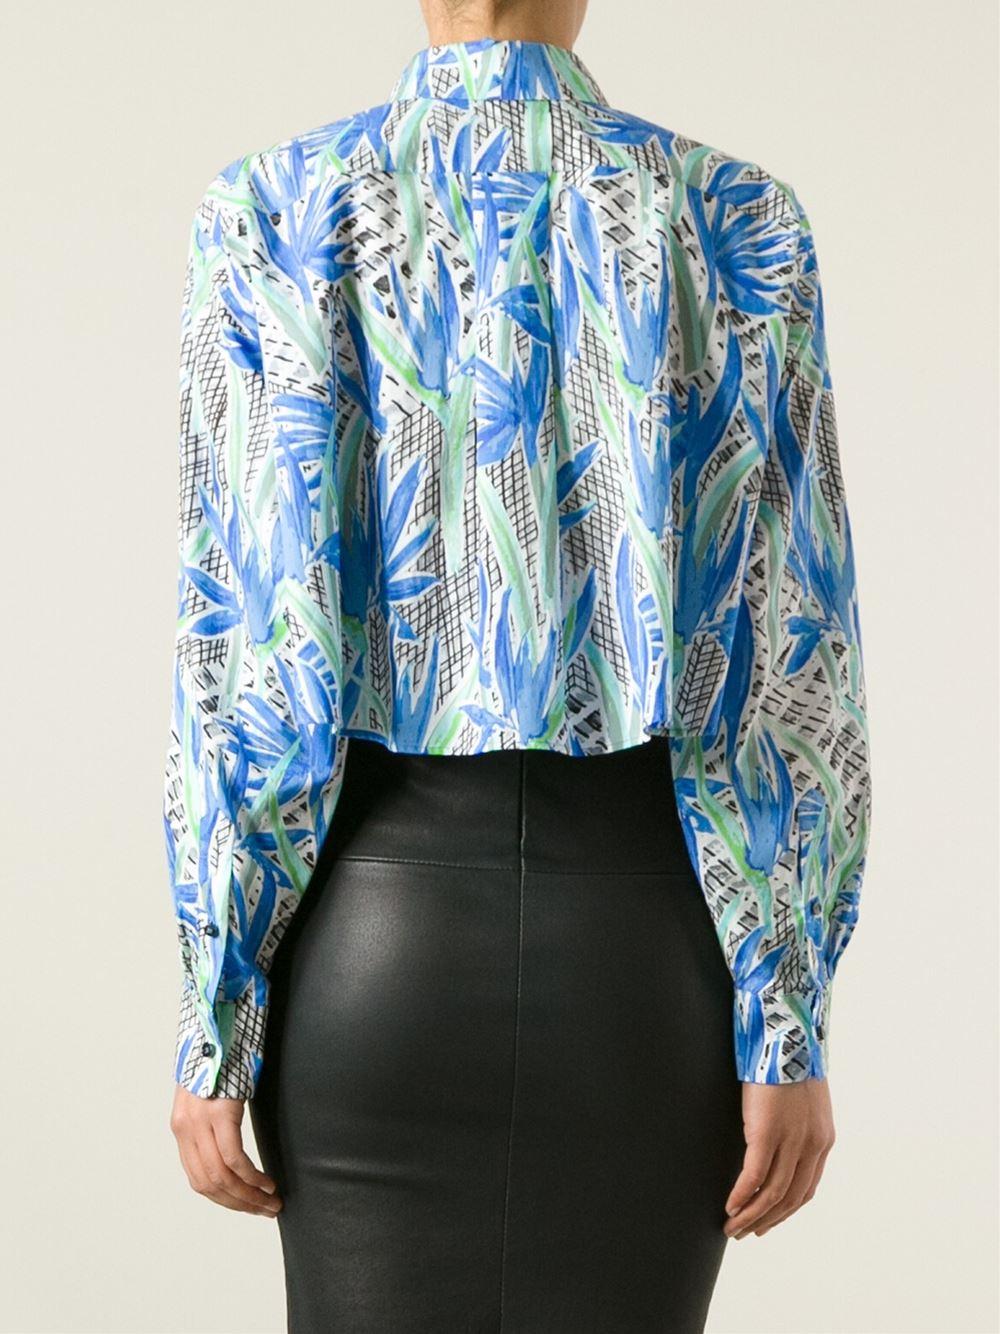 Kenzo Floral Printed Shirt - Dolci Trame - Farfetch.com